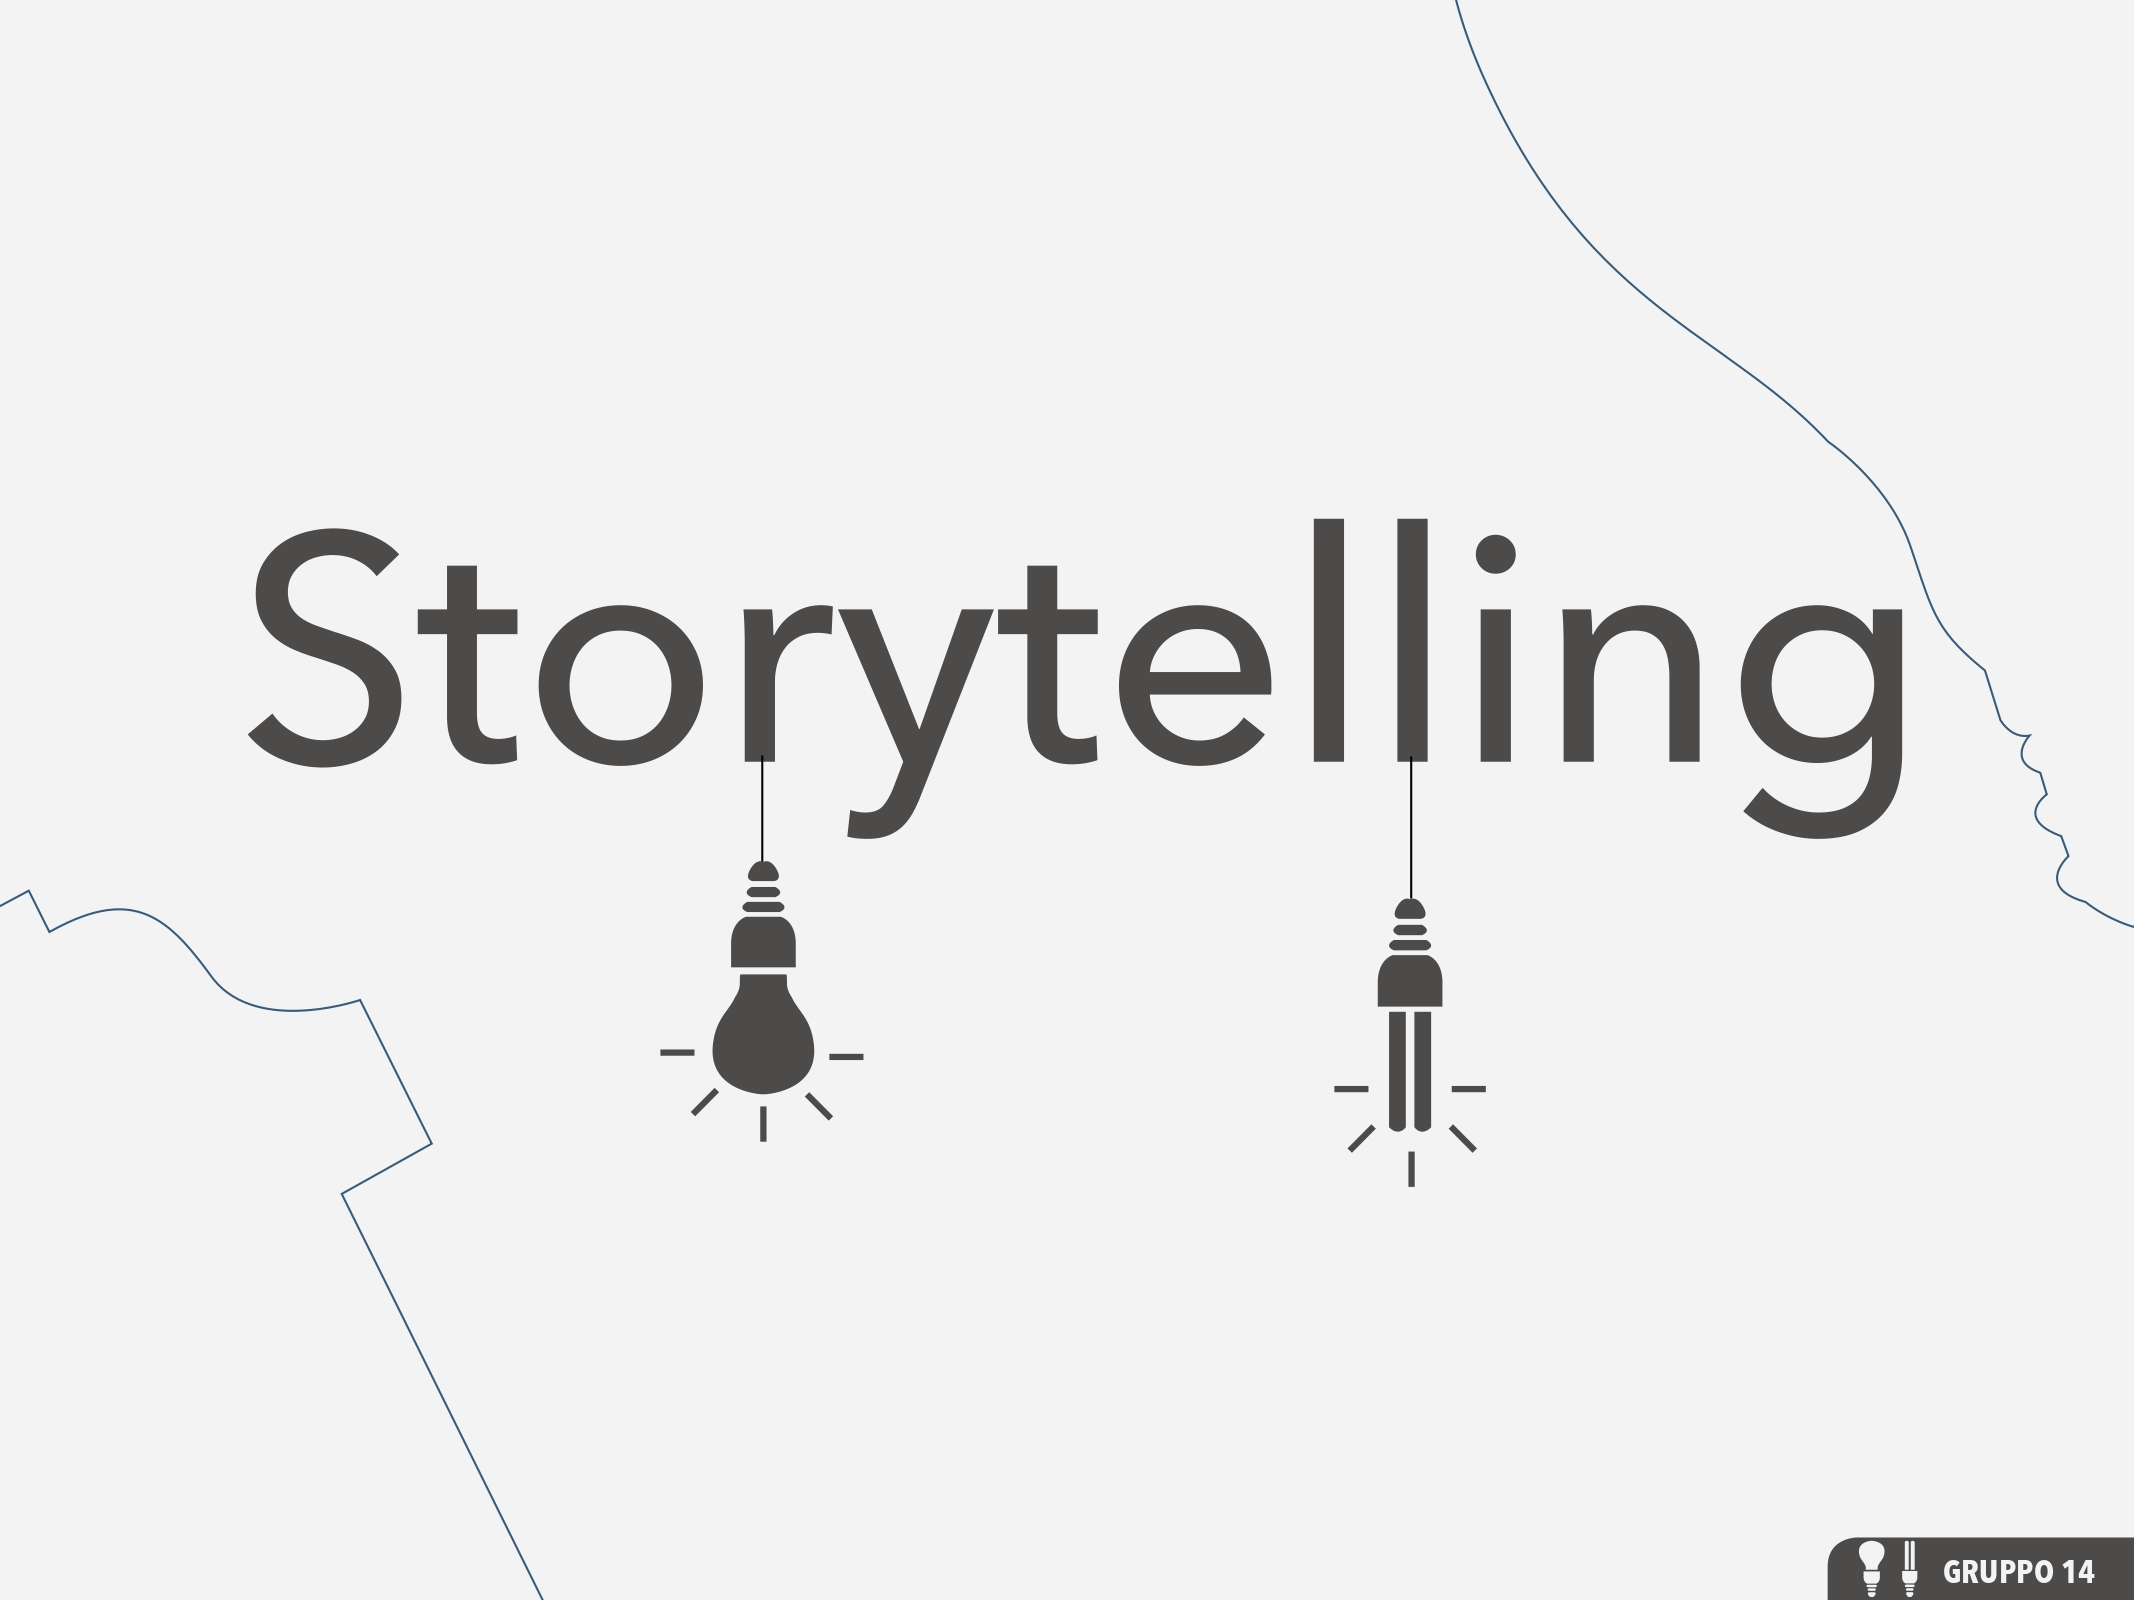 Hinckley Le idee non dormono mai 2016 Storytelling 02